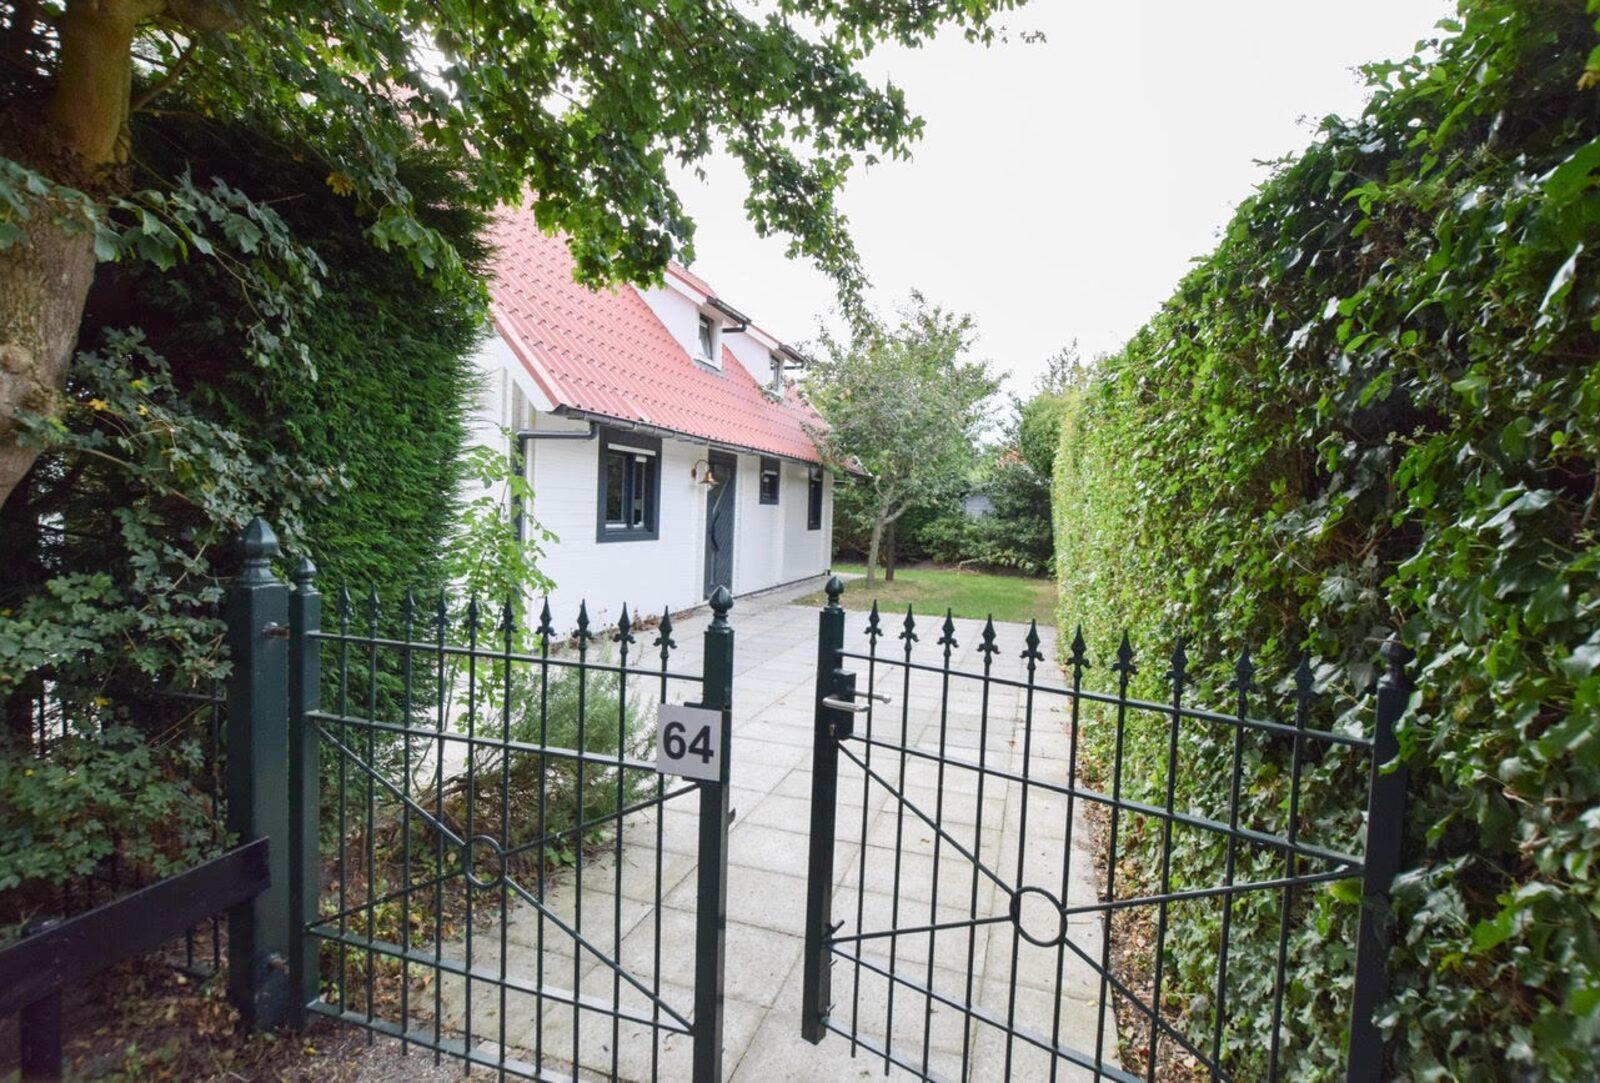 Vakantiehuis - Hoge Weide 64 | Oostkapelle